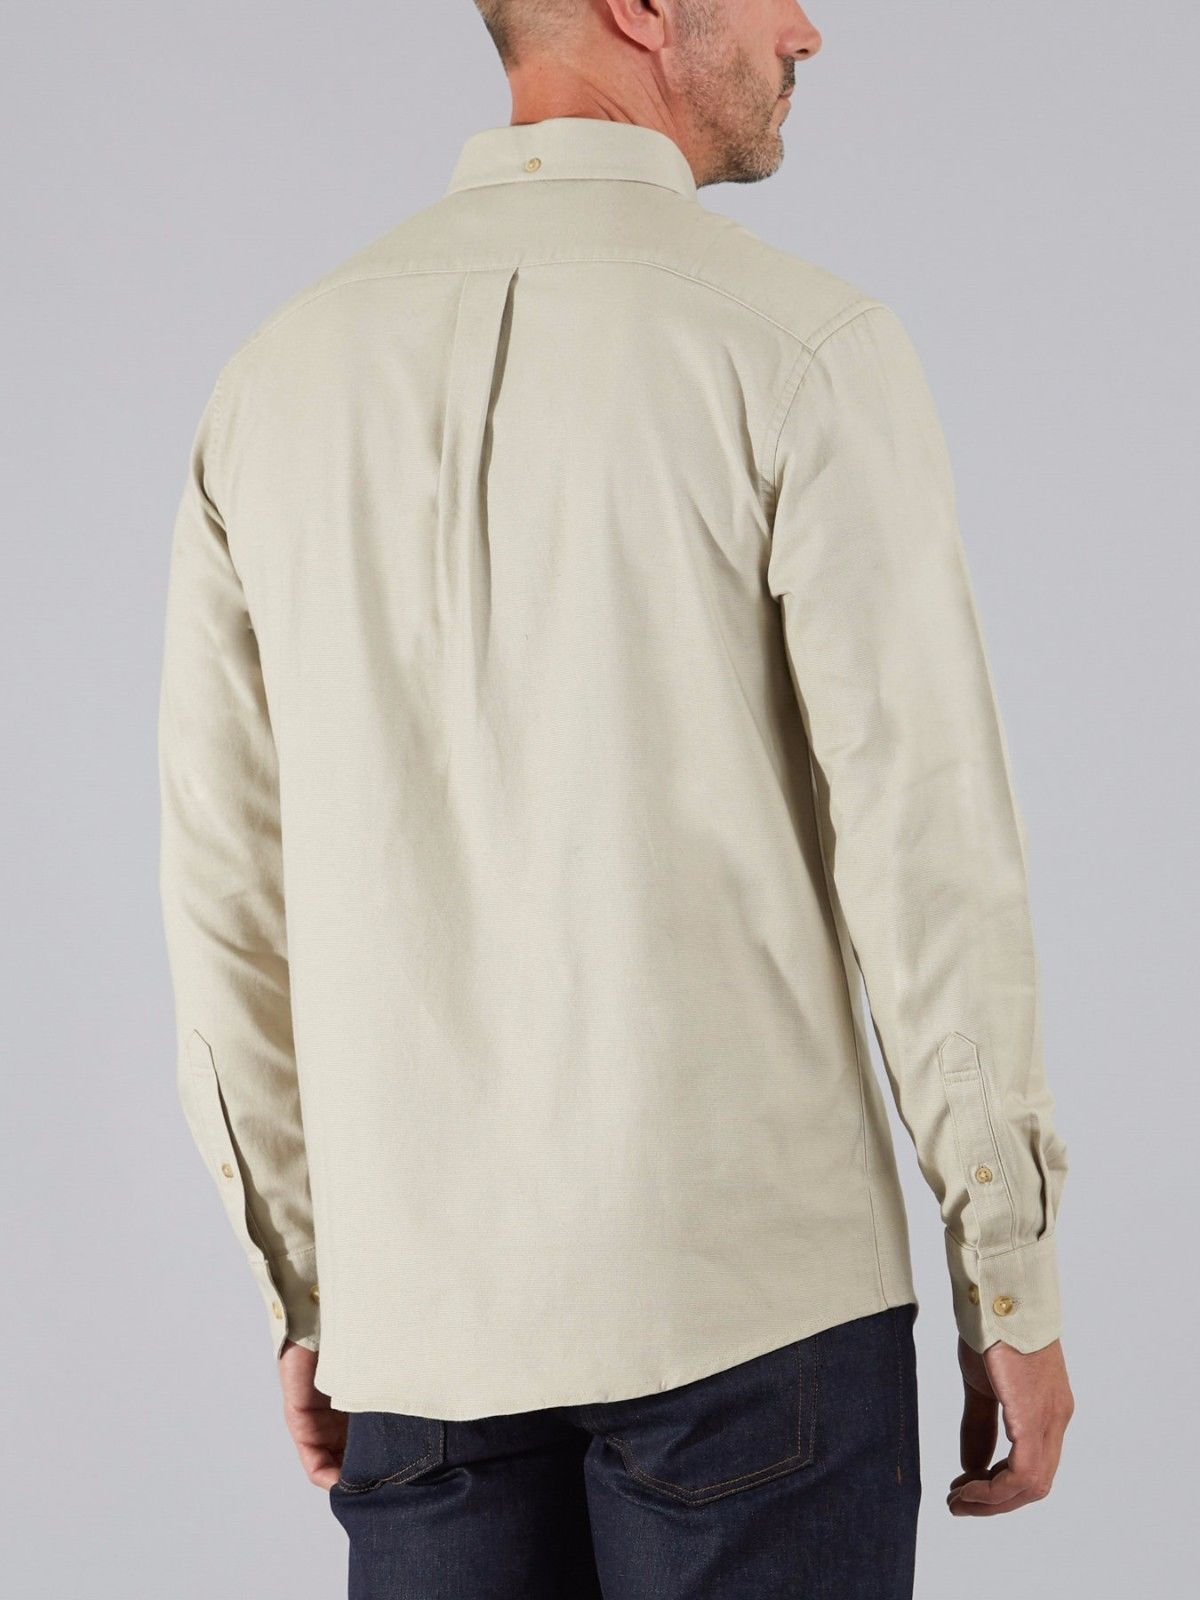 Farah Thompson warm ecru Oxford long-sleeve button-down shirt size small-2XL